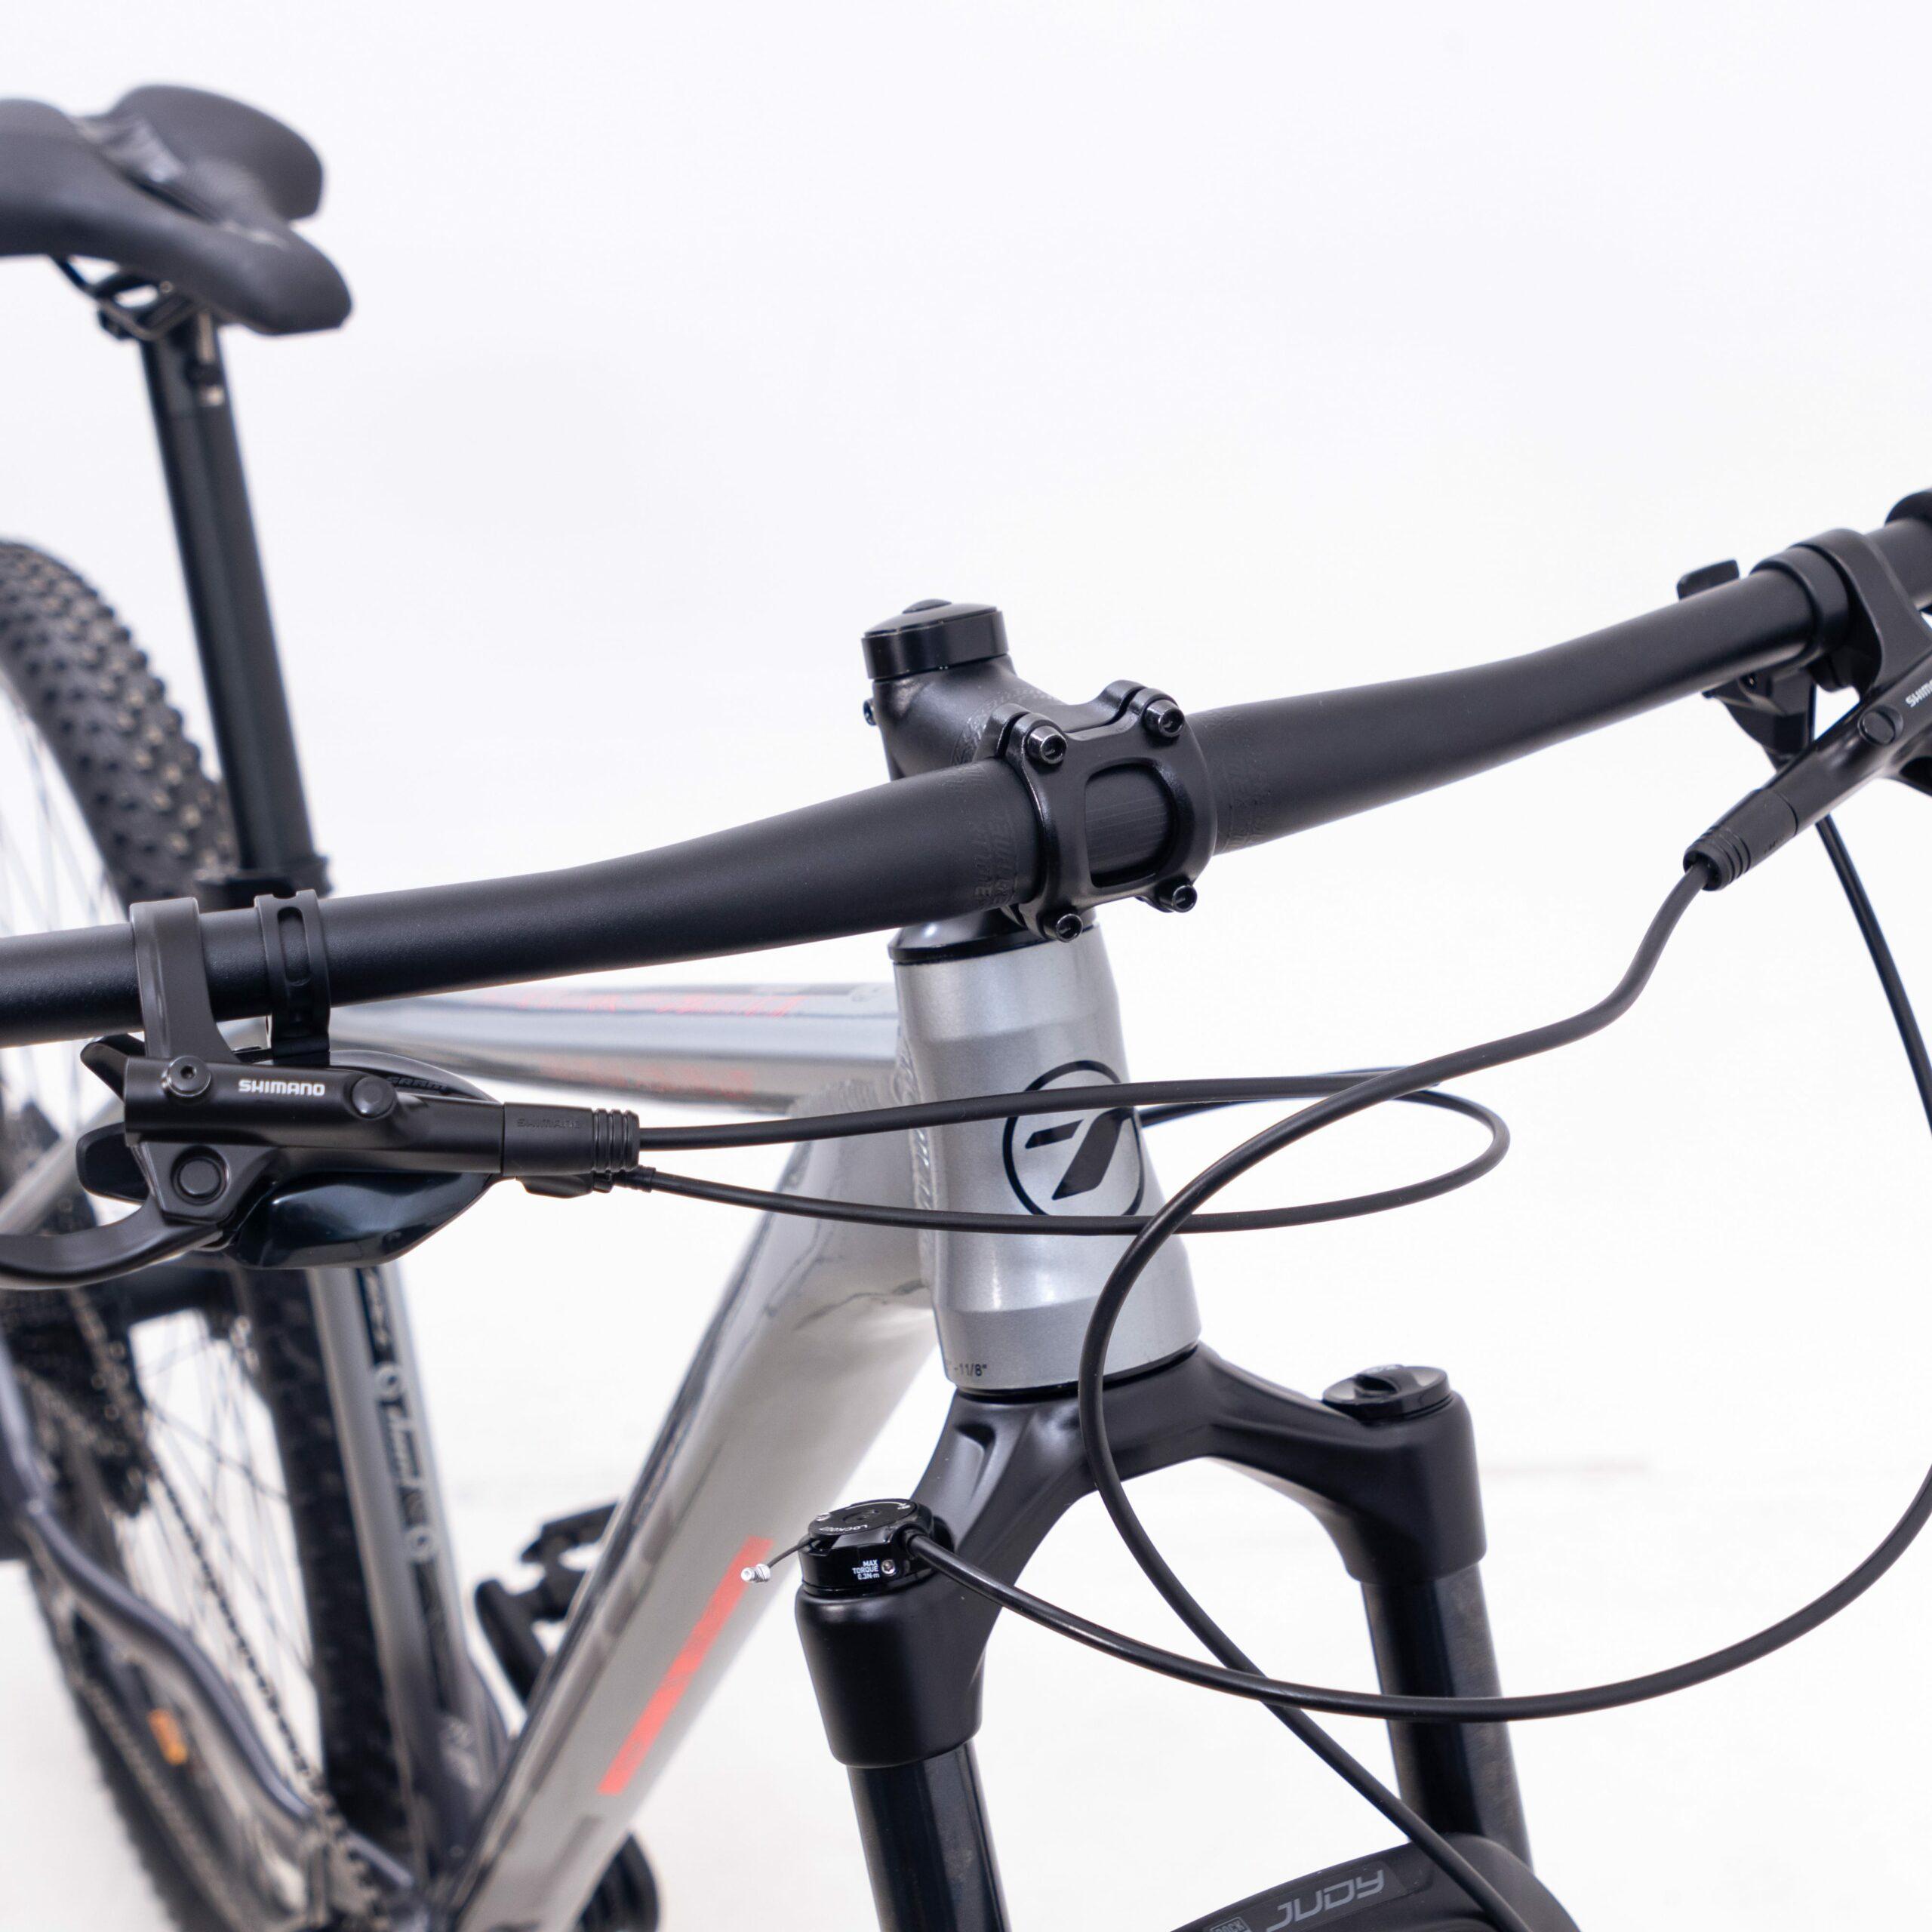 Bicicleta TSW Yukon | GX-SM | 2021/2022 4